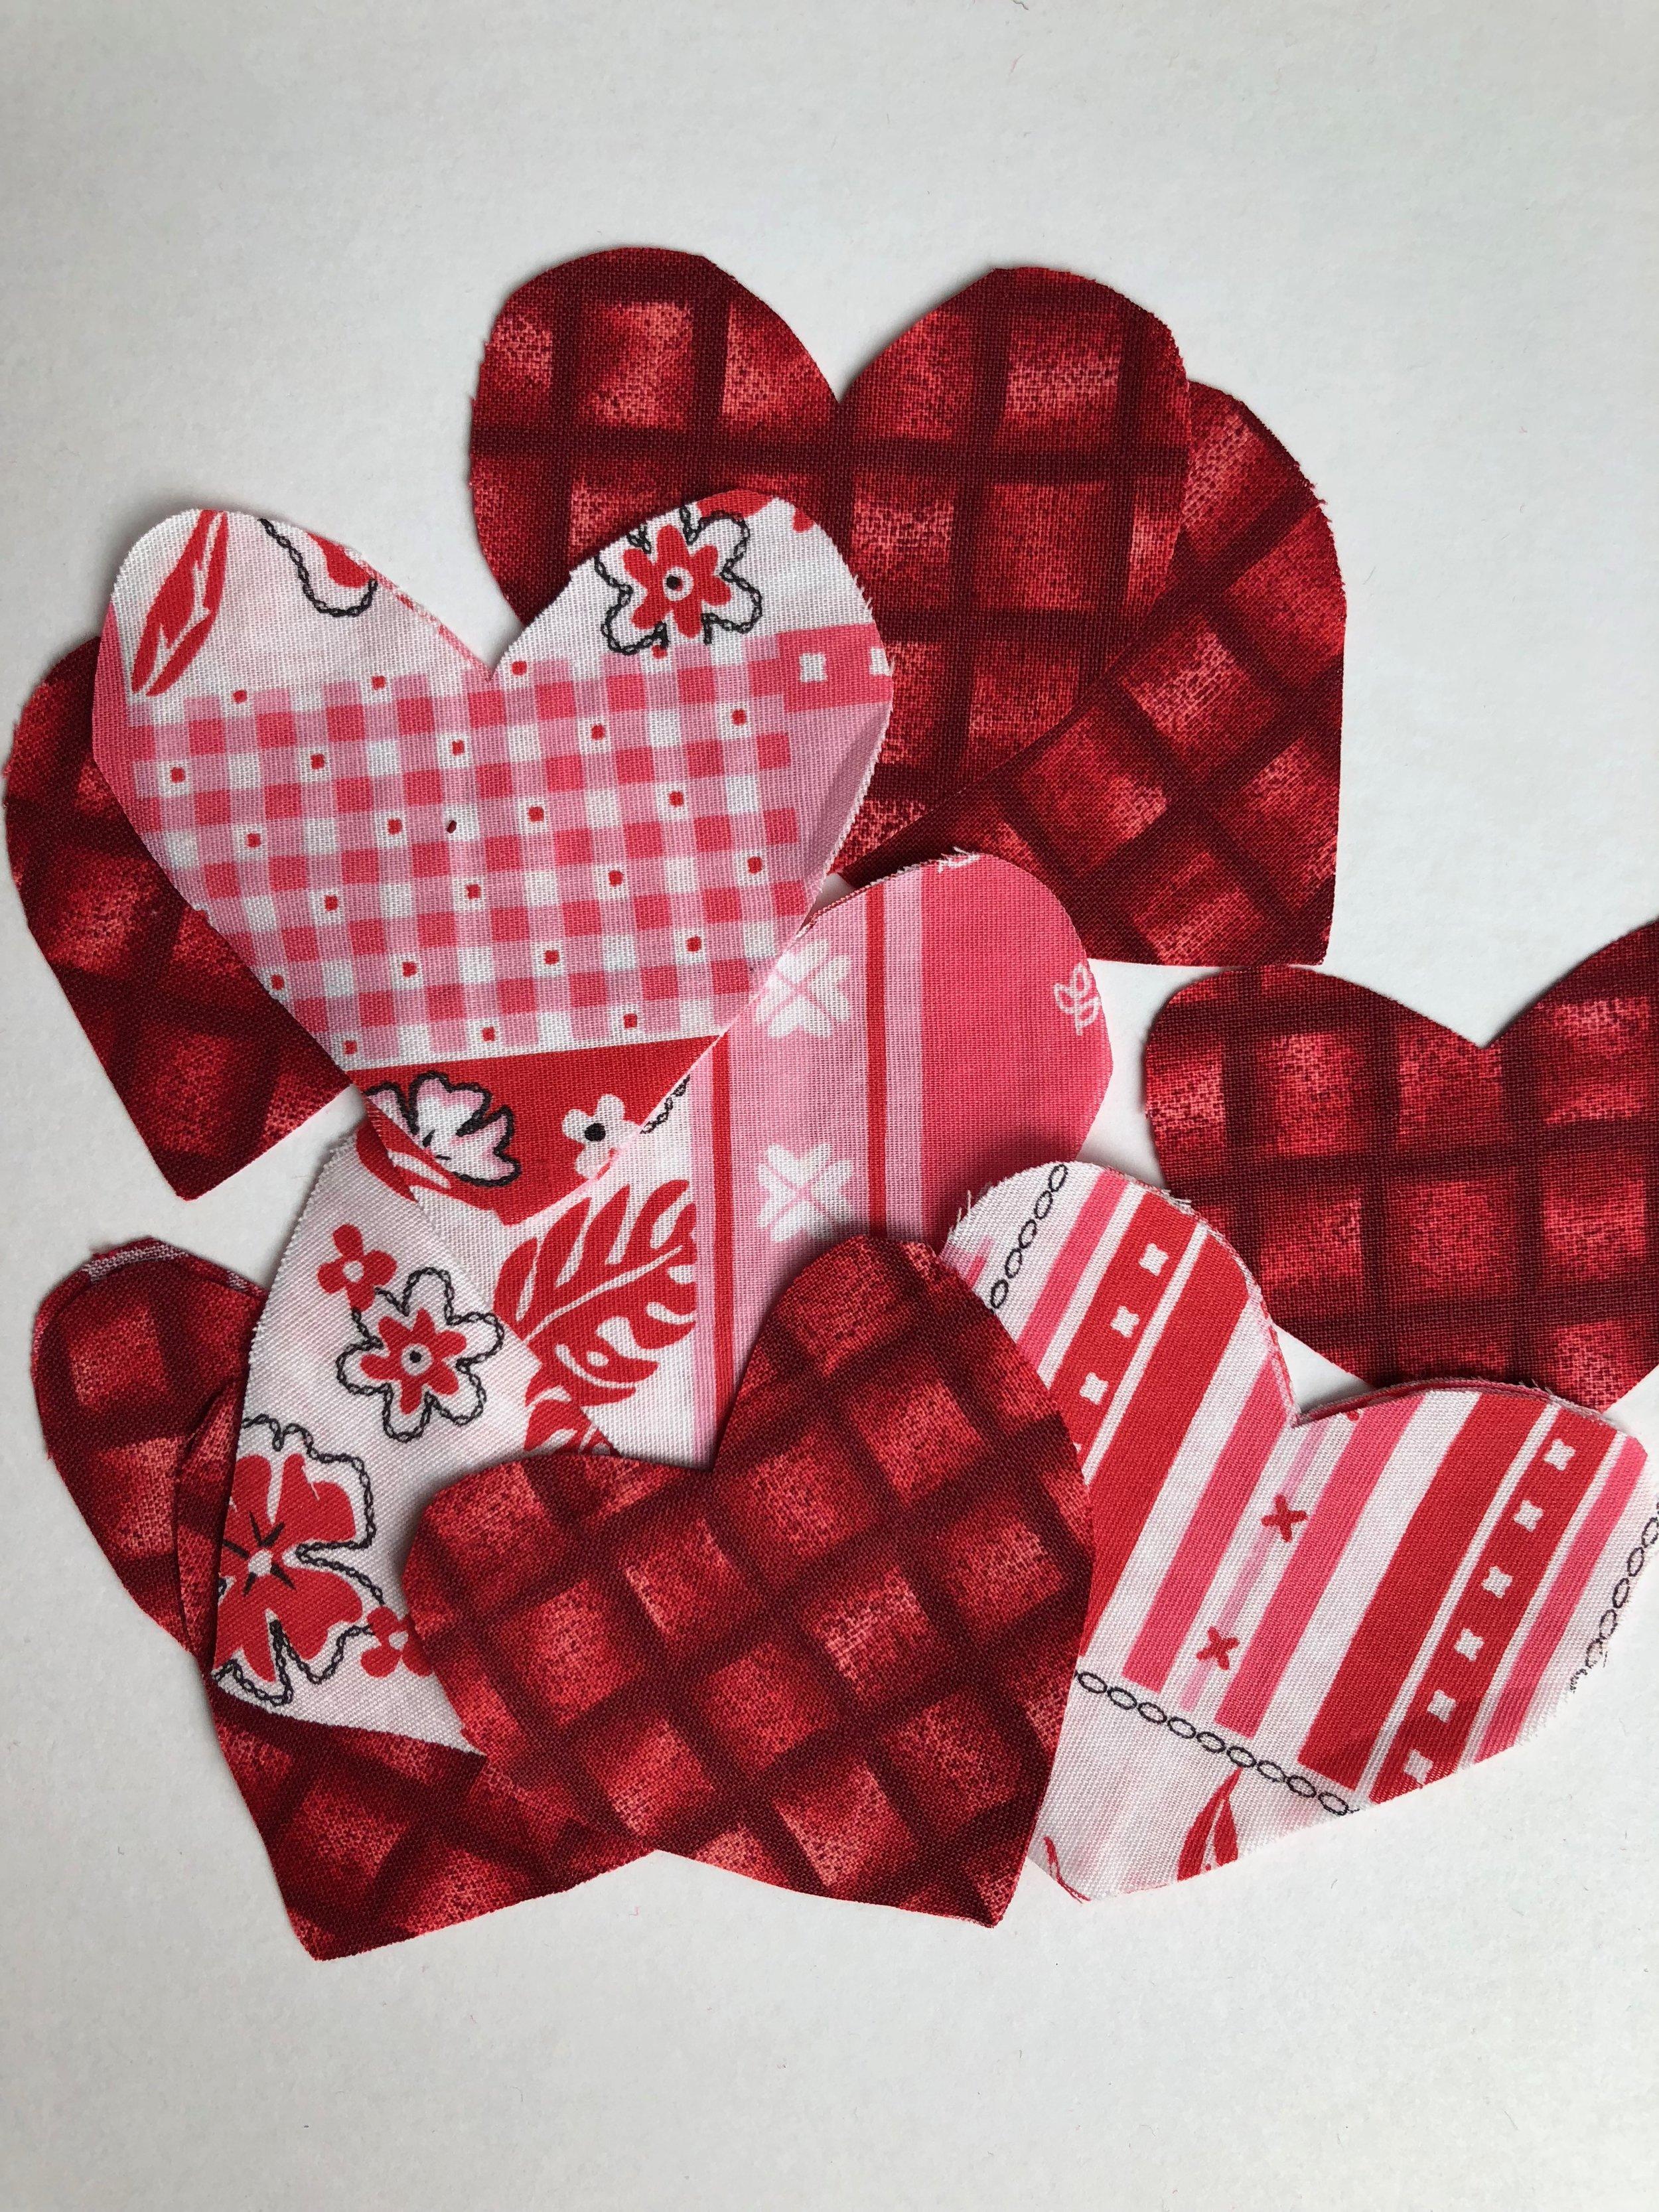 Fabric heart shape cutouts